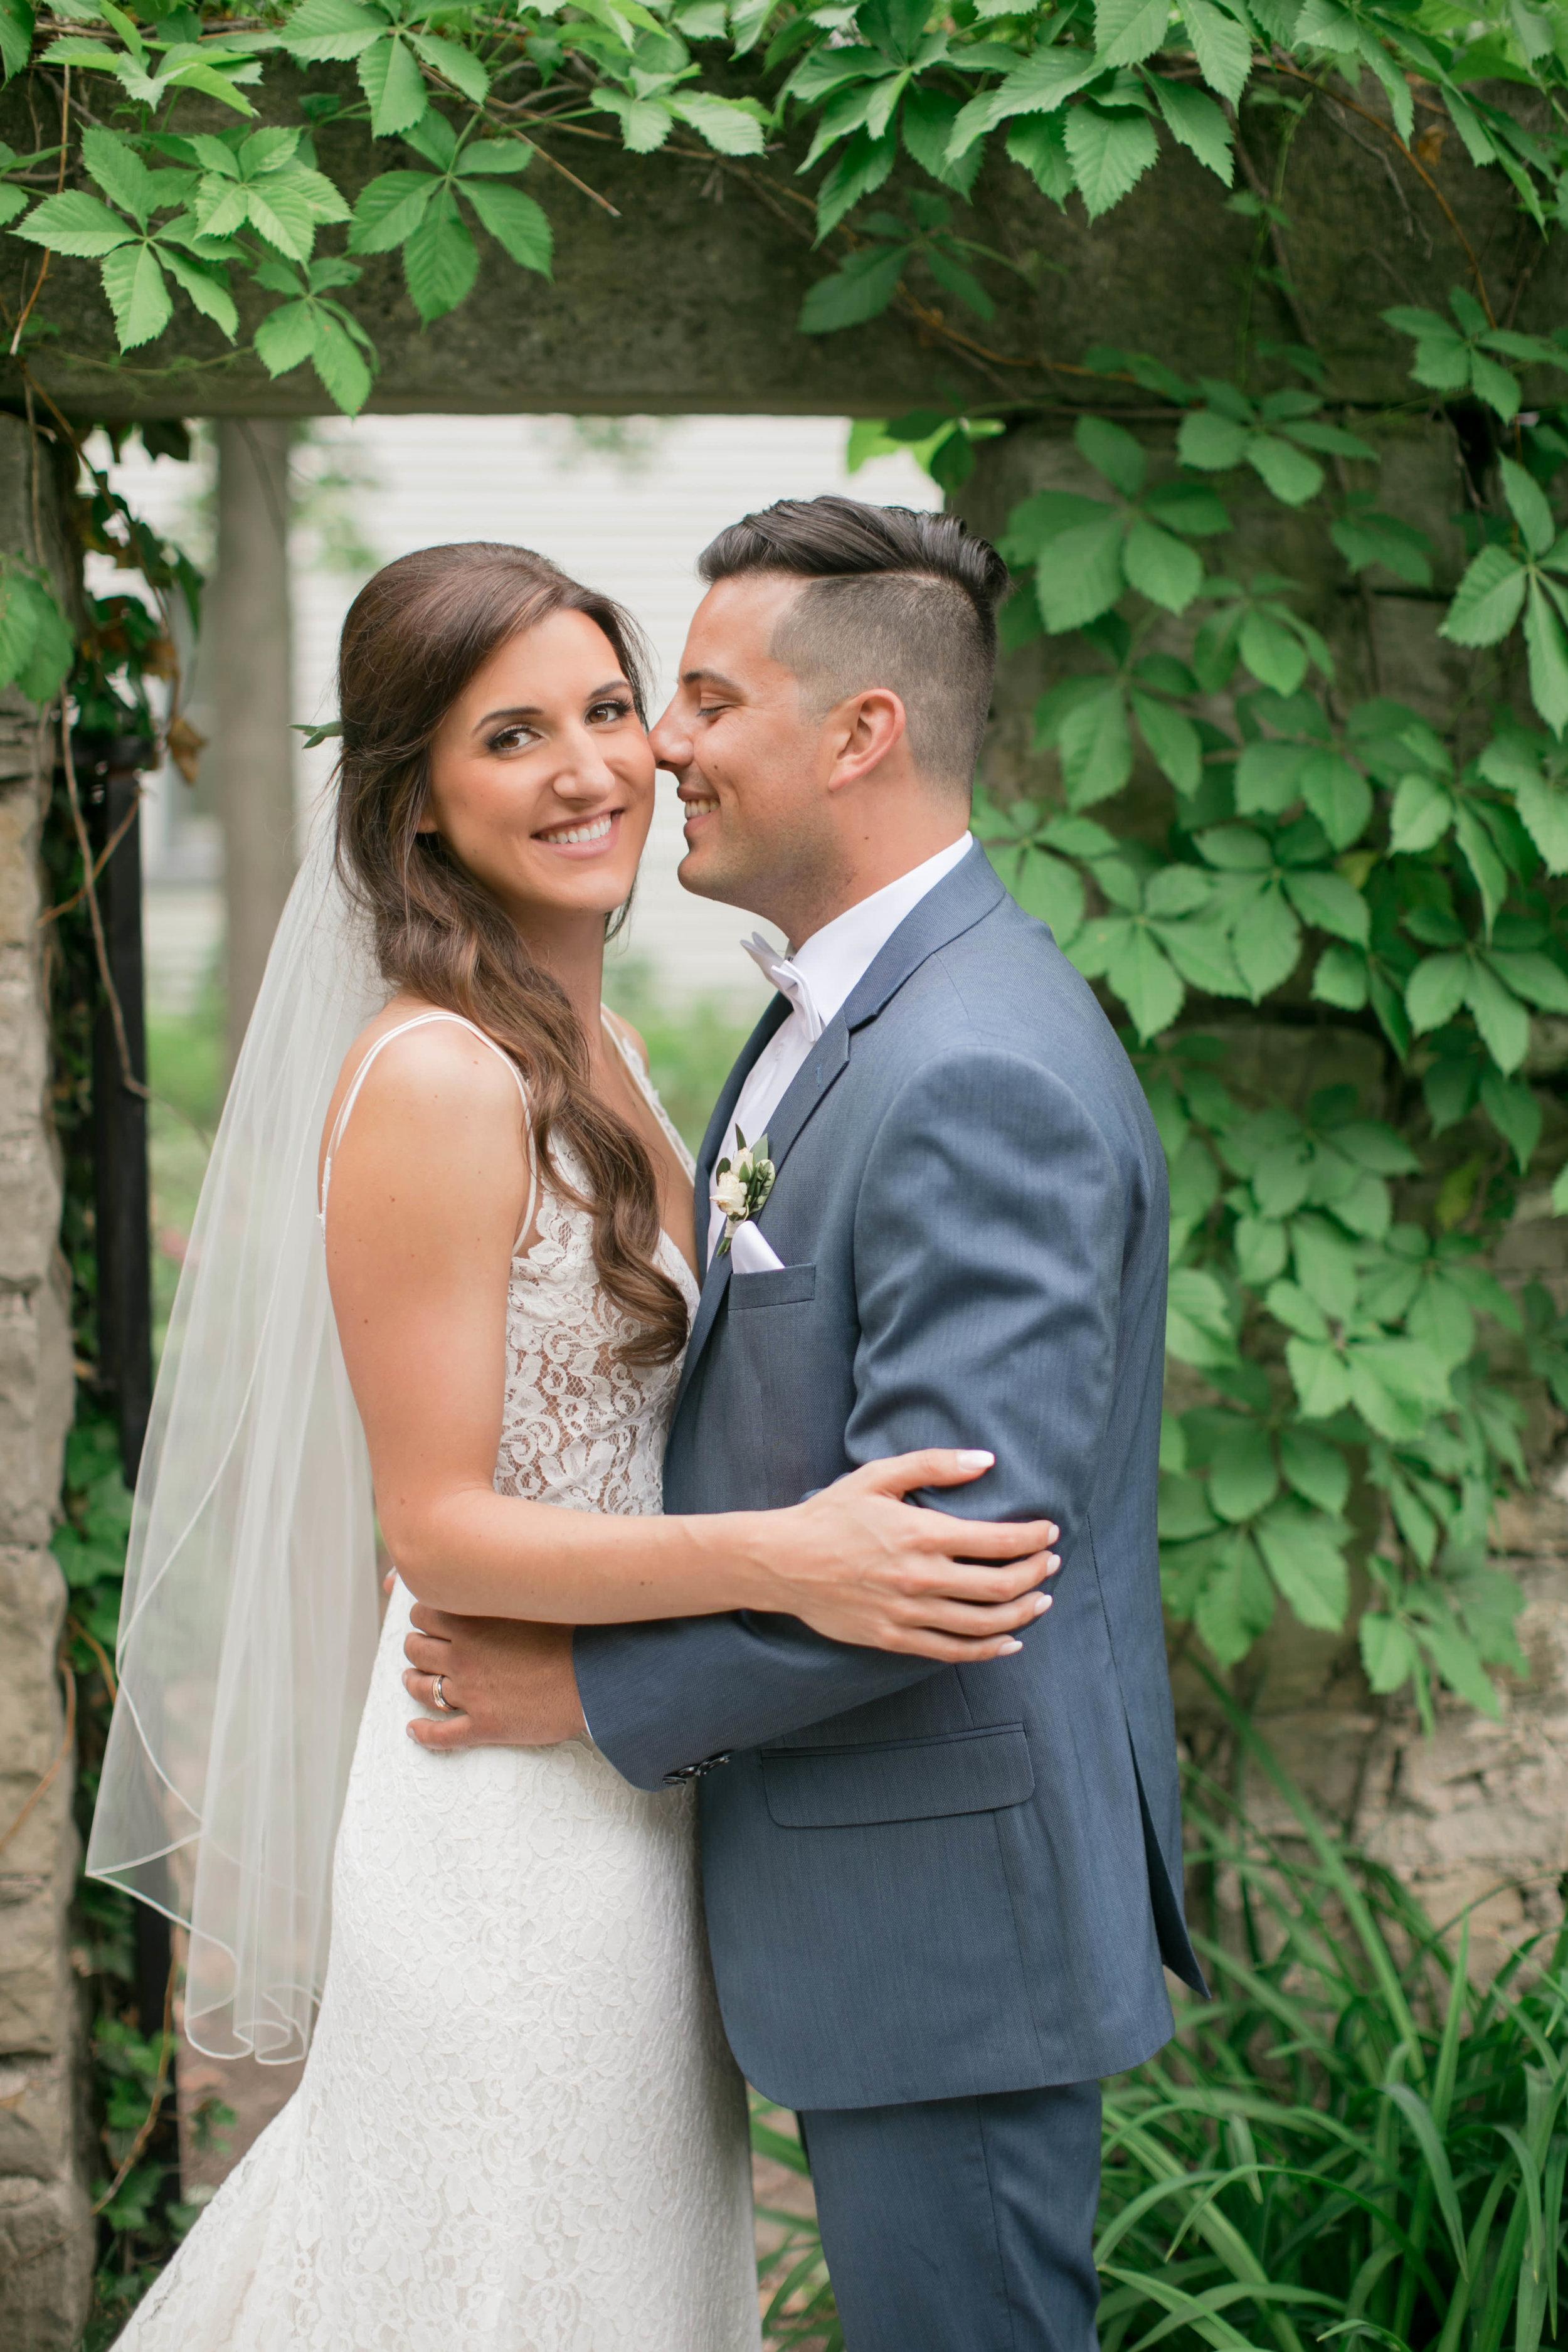 Miranda___Daniel___Daniel_Ricci_Weddings___High_Res._Finals_419.jpg